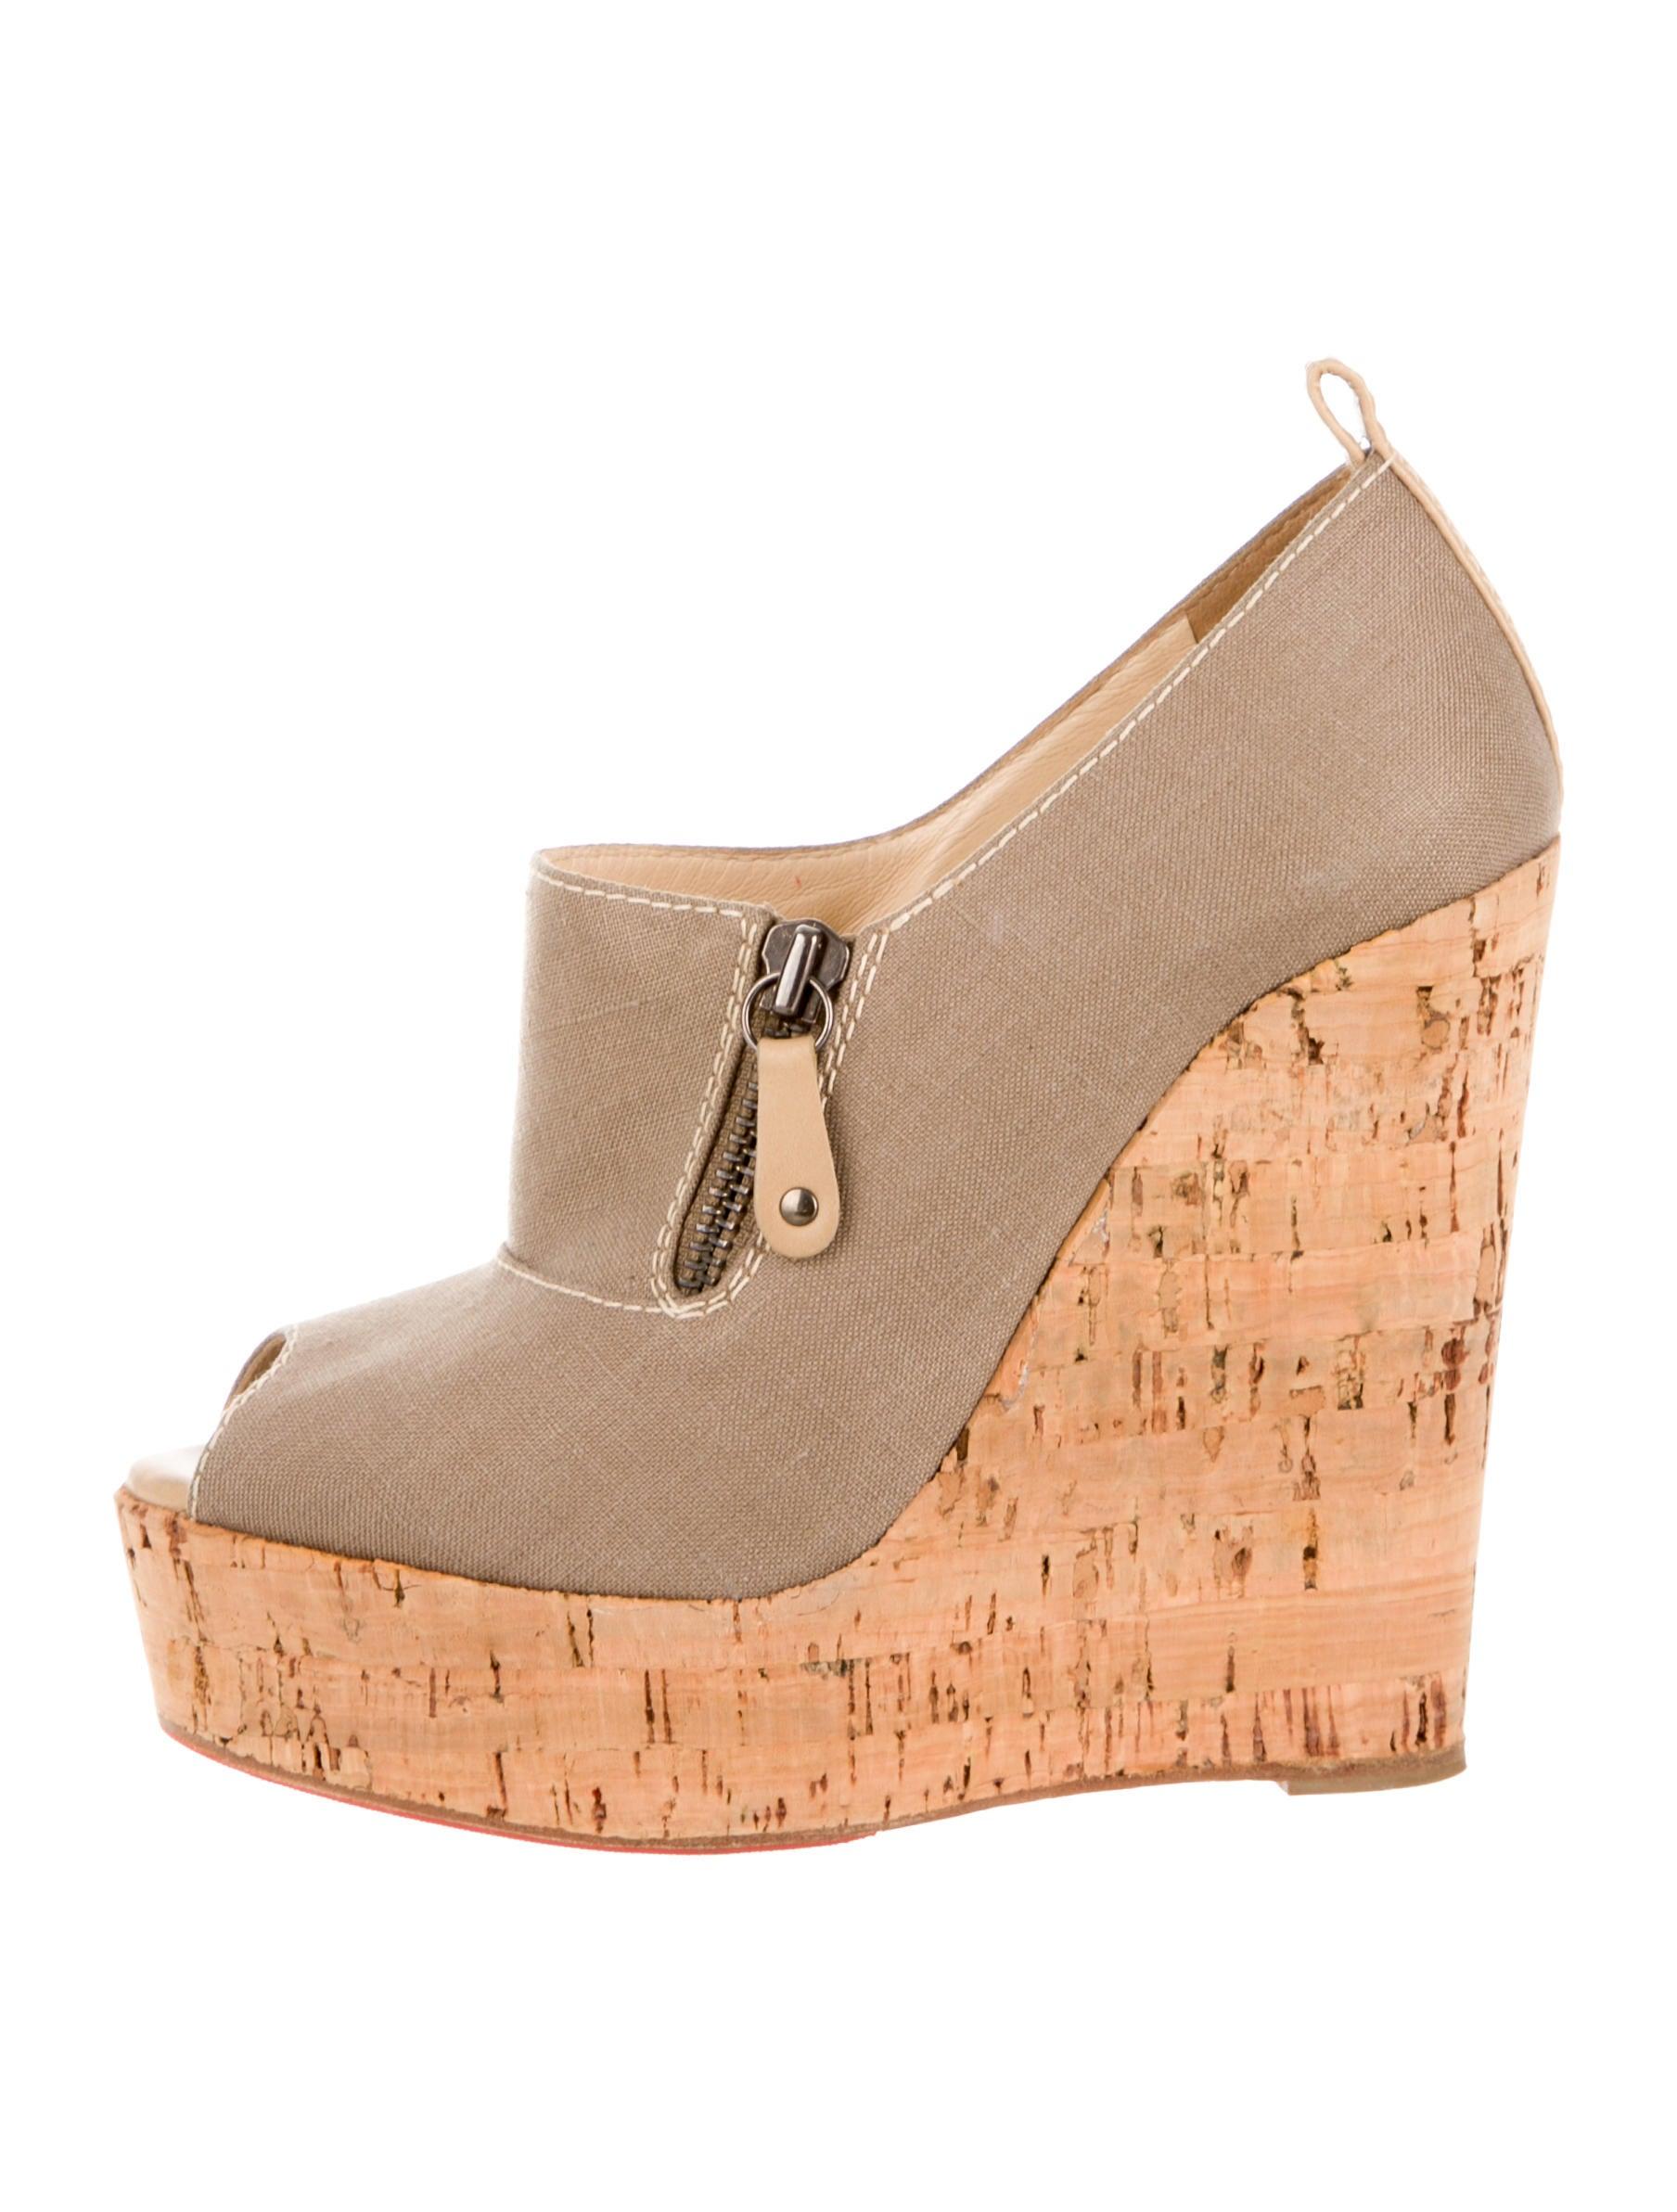 christian louboutin peep-toe cork wedges